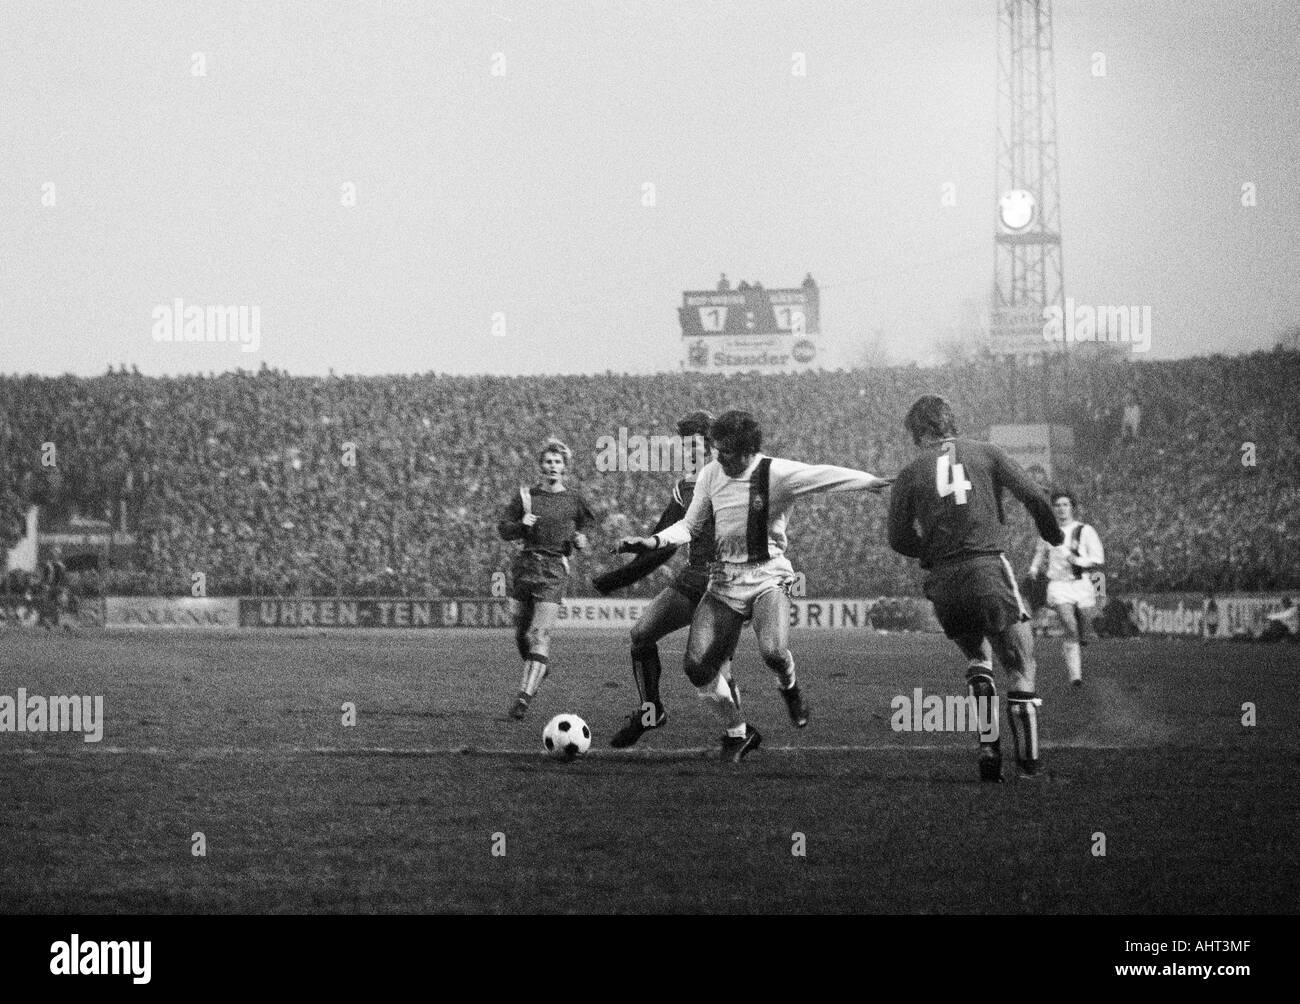 football, Bundesliga, 1970/1971, Stadium at the Hafenstrasse in Essen, Rot-Weiss Essen versus Borussia Moenchengladbach 1:2, scene of the match, f.l.t.r. Peter Czernotzky, Hermann Erlhoff (both RWE), Jupp Heynckes (MG), Wolfgang Rausch (RWE) - Stock Image